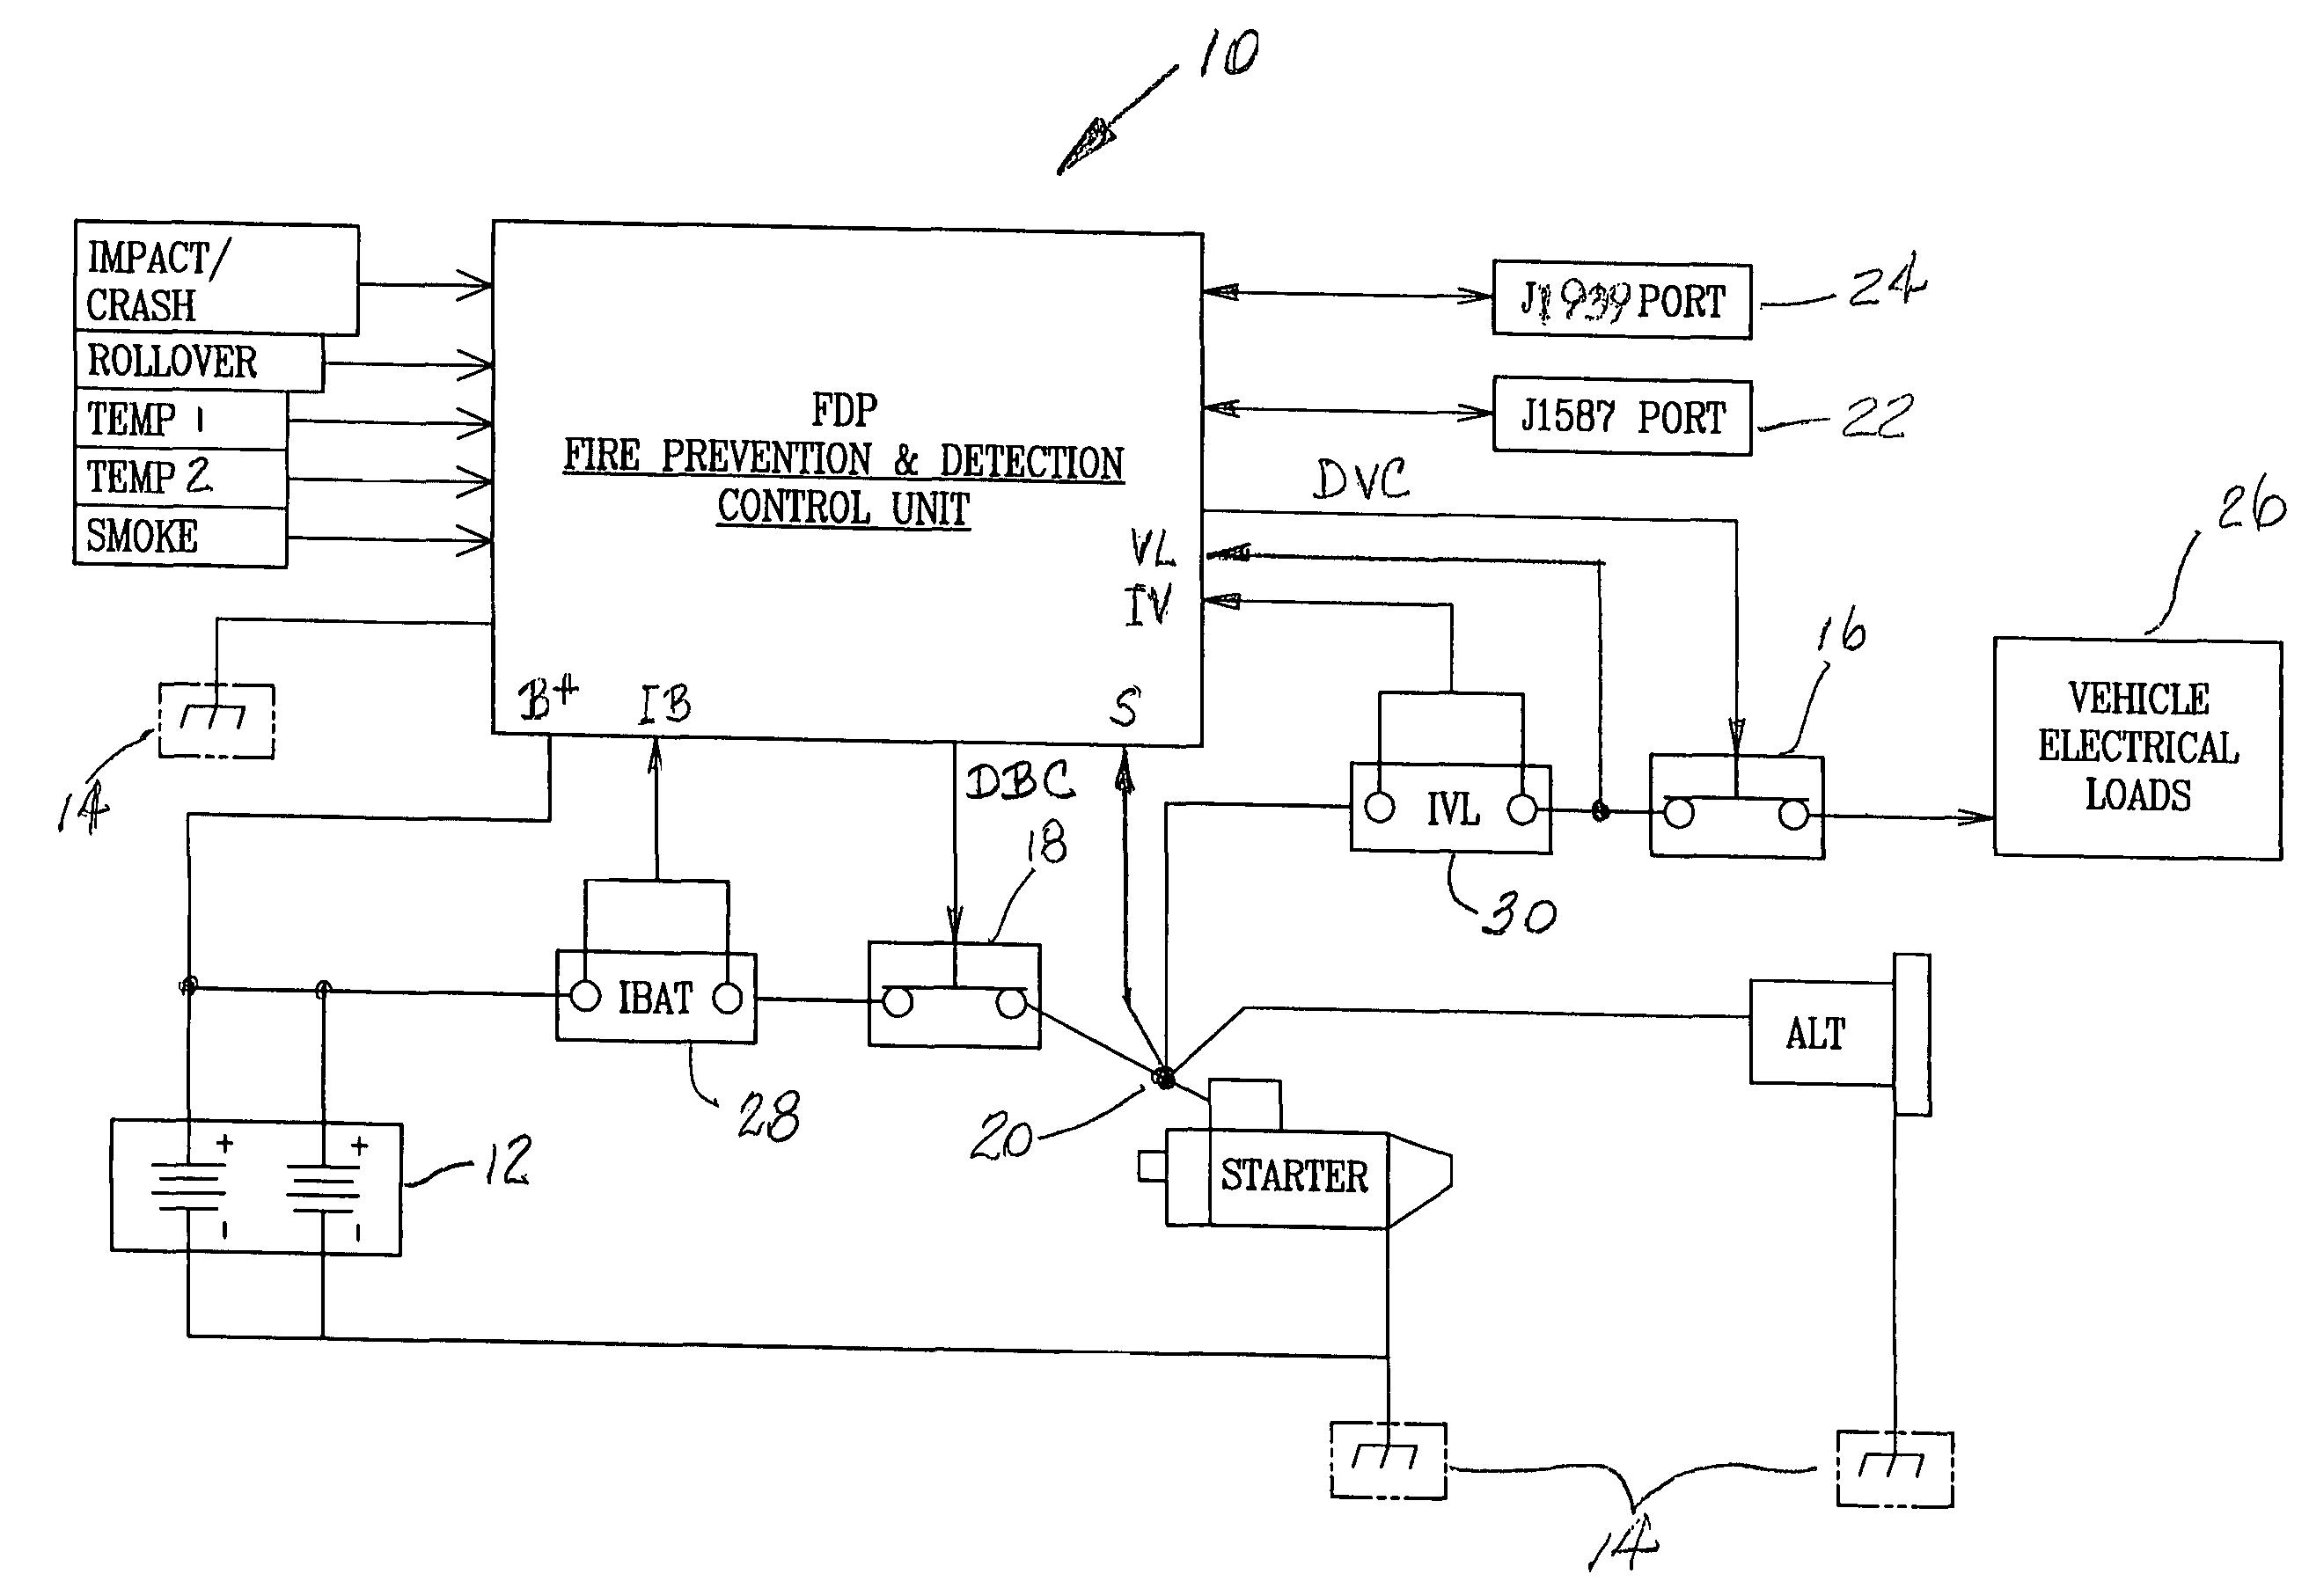 Car Alarm System Wiring Diagram Moreover Low Voltage Detector Sestem Flashpoint Diagrams Circuit